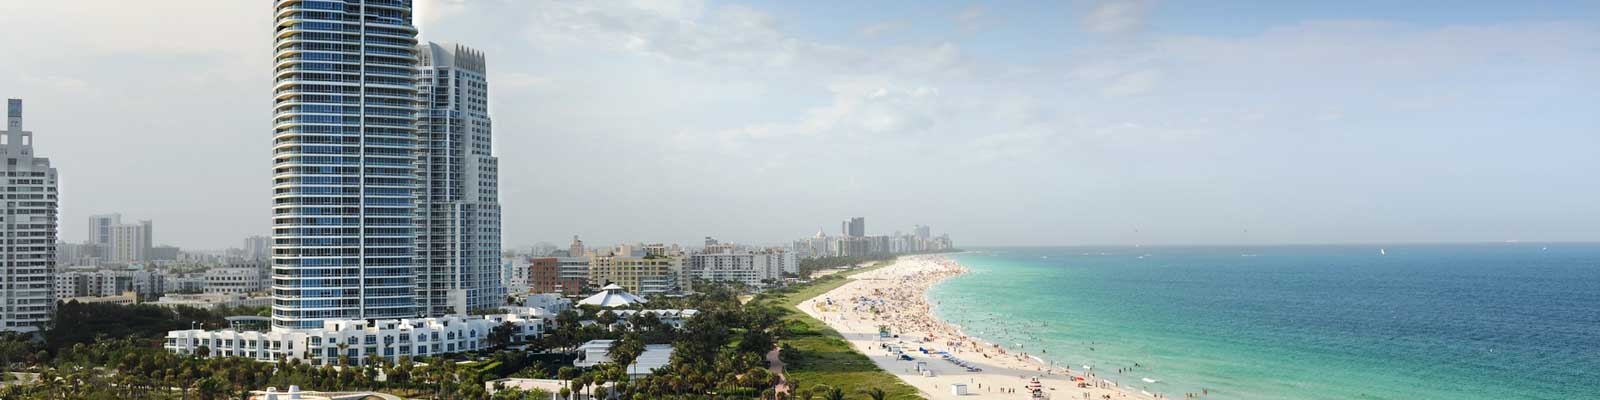 EUA Imoveis Frente ao Mar  Varanda Residencial, Comercial, Terrenos. A venda, ou para Alugar.